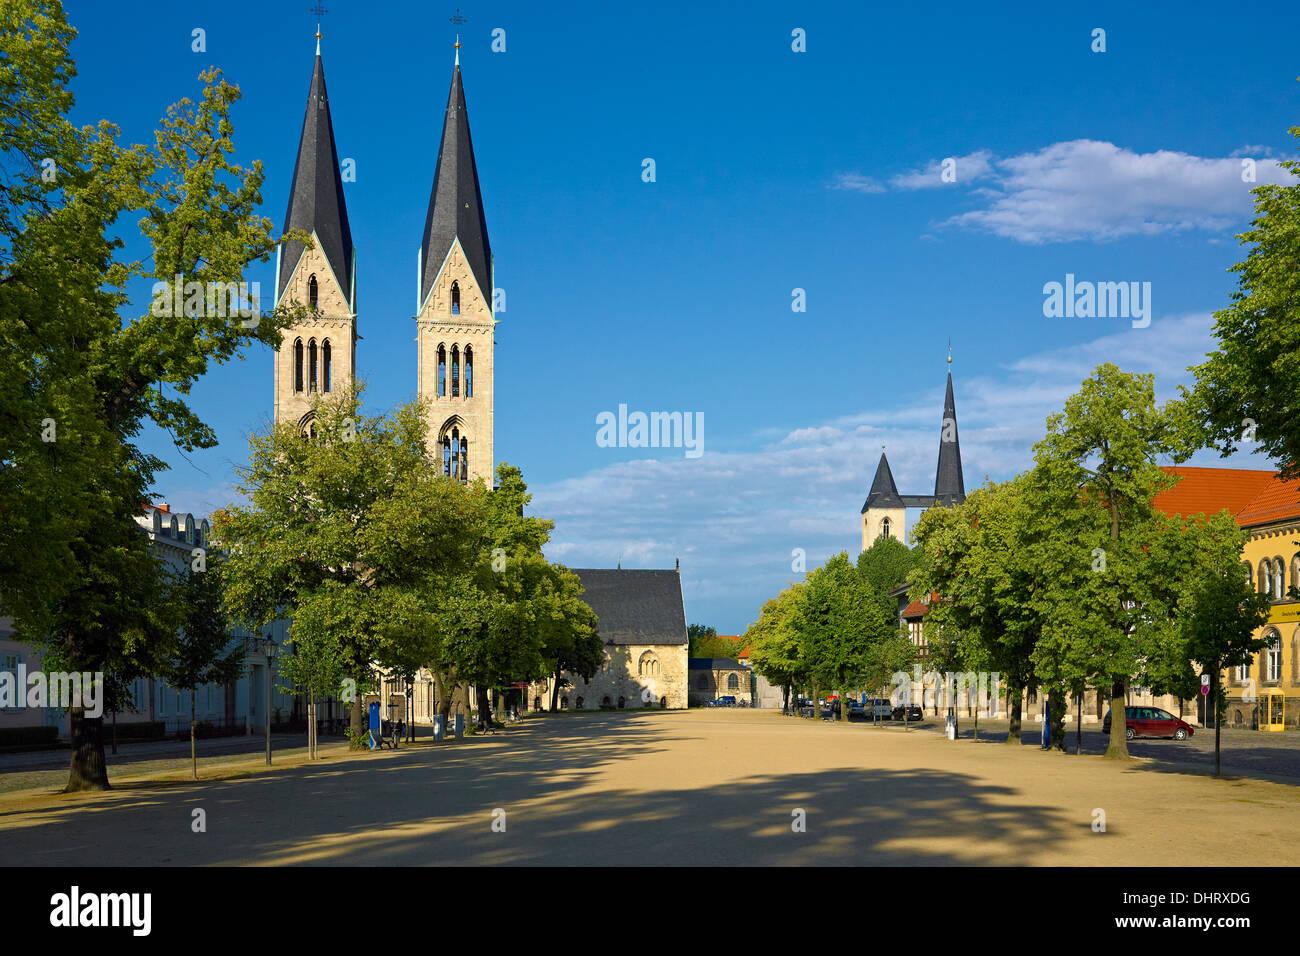 Quadratische Domplatz mit Dom Halberstadt, Halberstadt, Sachsen-Anhalt, Deutschland Stockbild